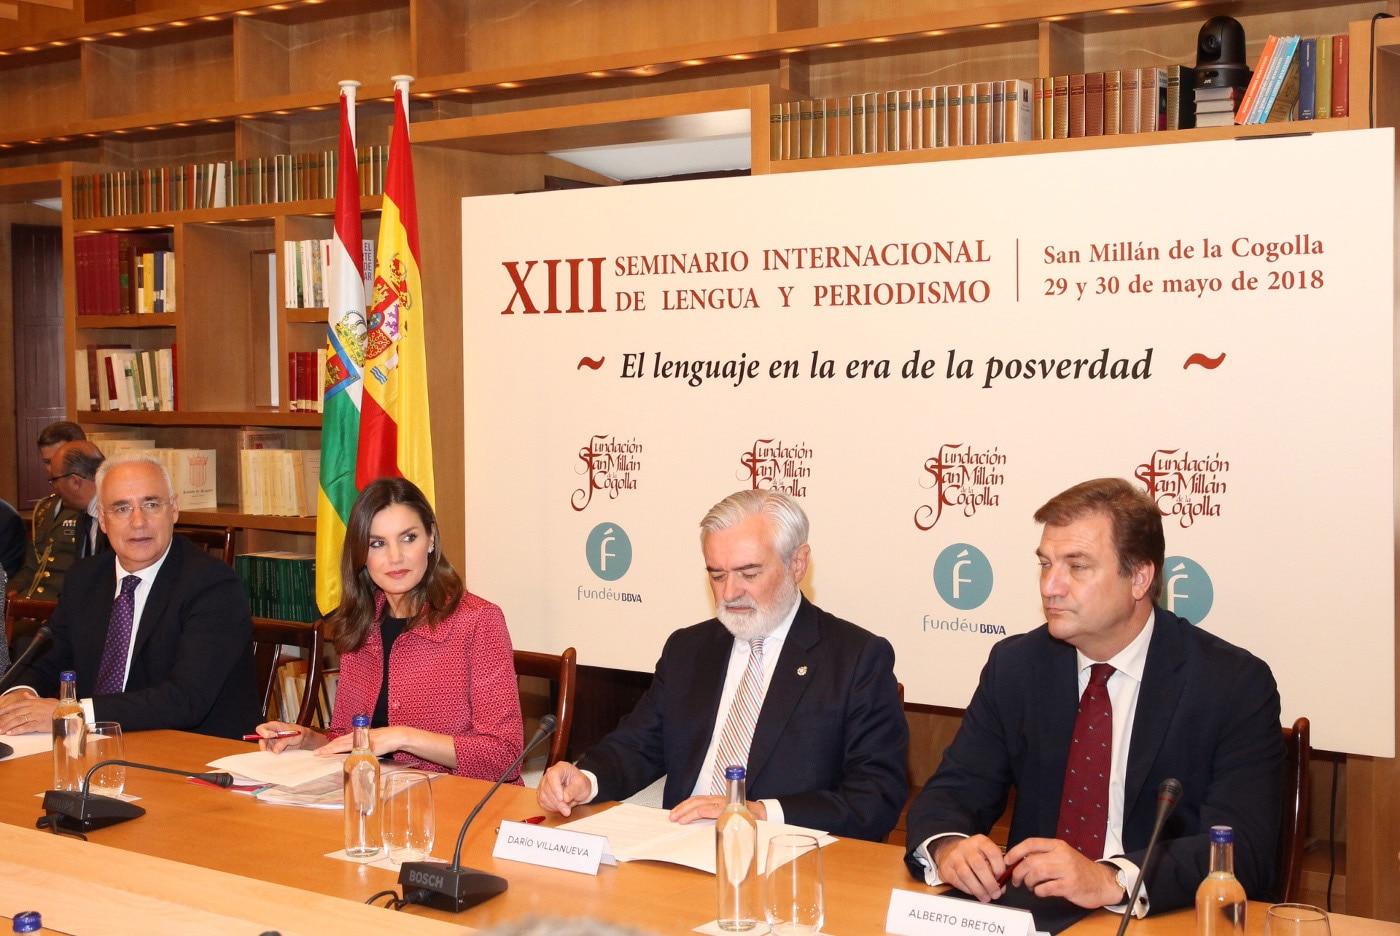 La reina Letizia inaugura el Seminario Internacional de Fundéu BBVA